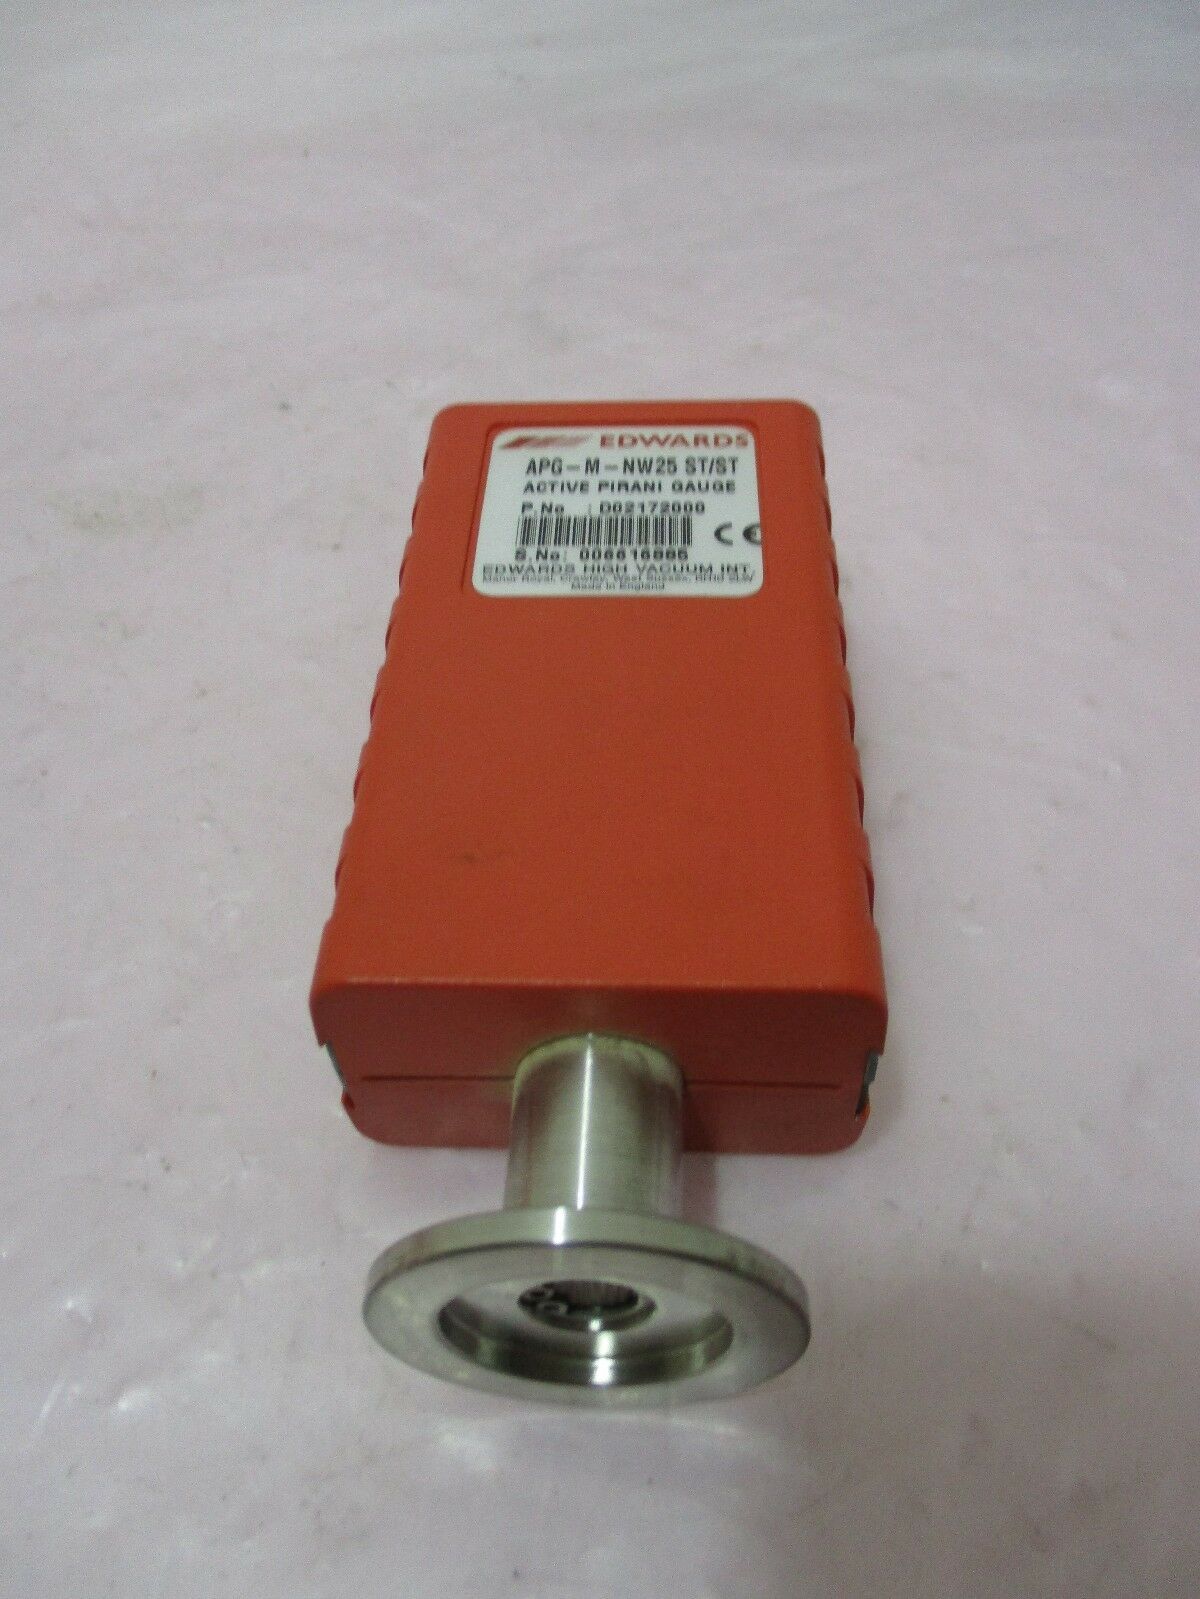 Edwards APG-M-NW25 ST/ST Active Pirani Gauge, 420575